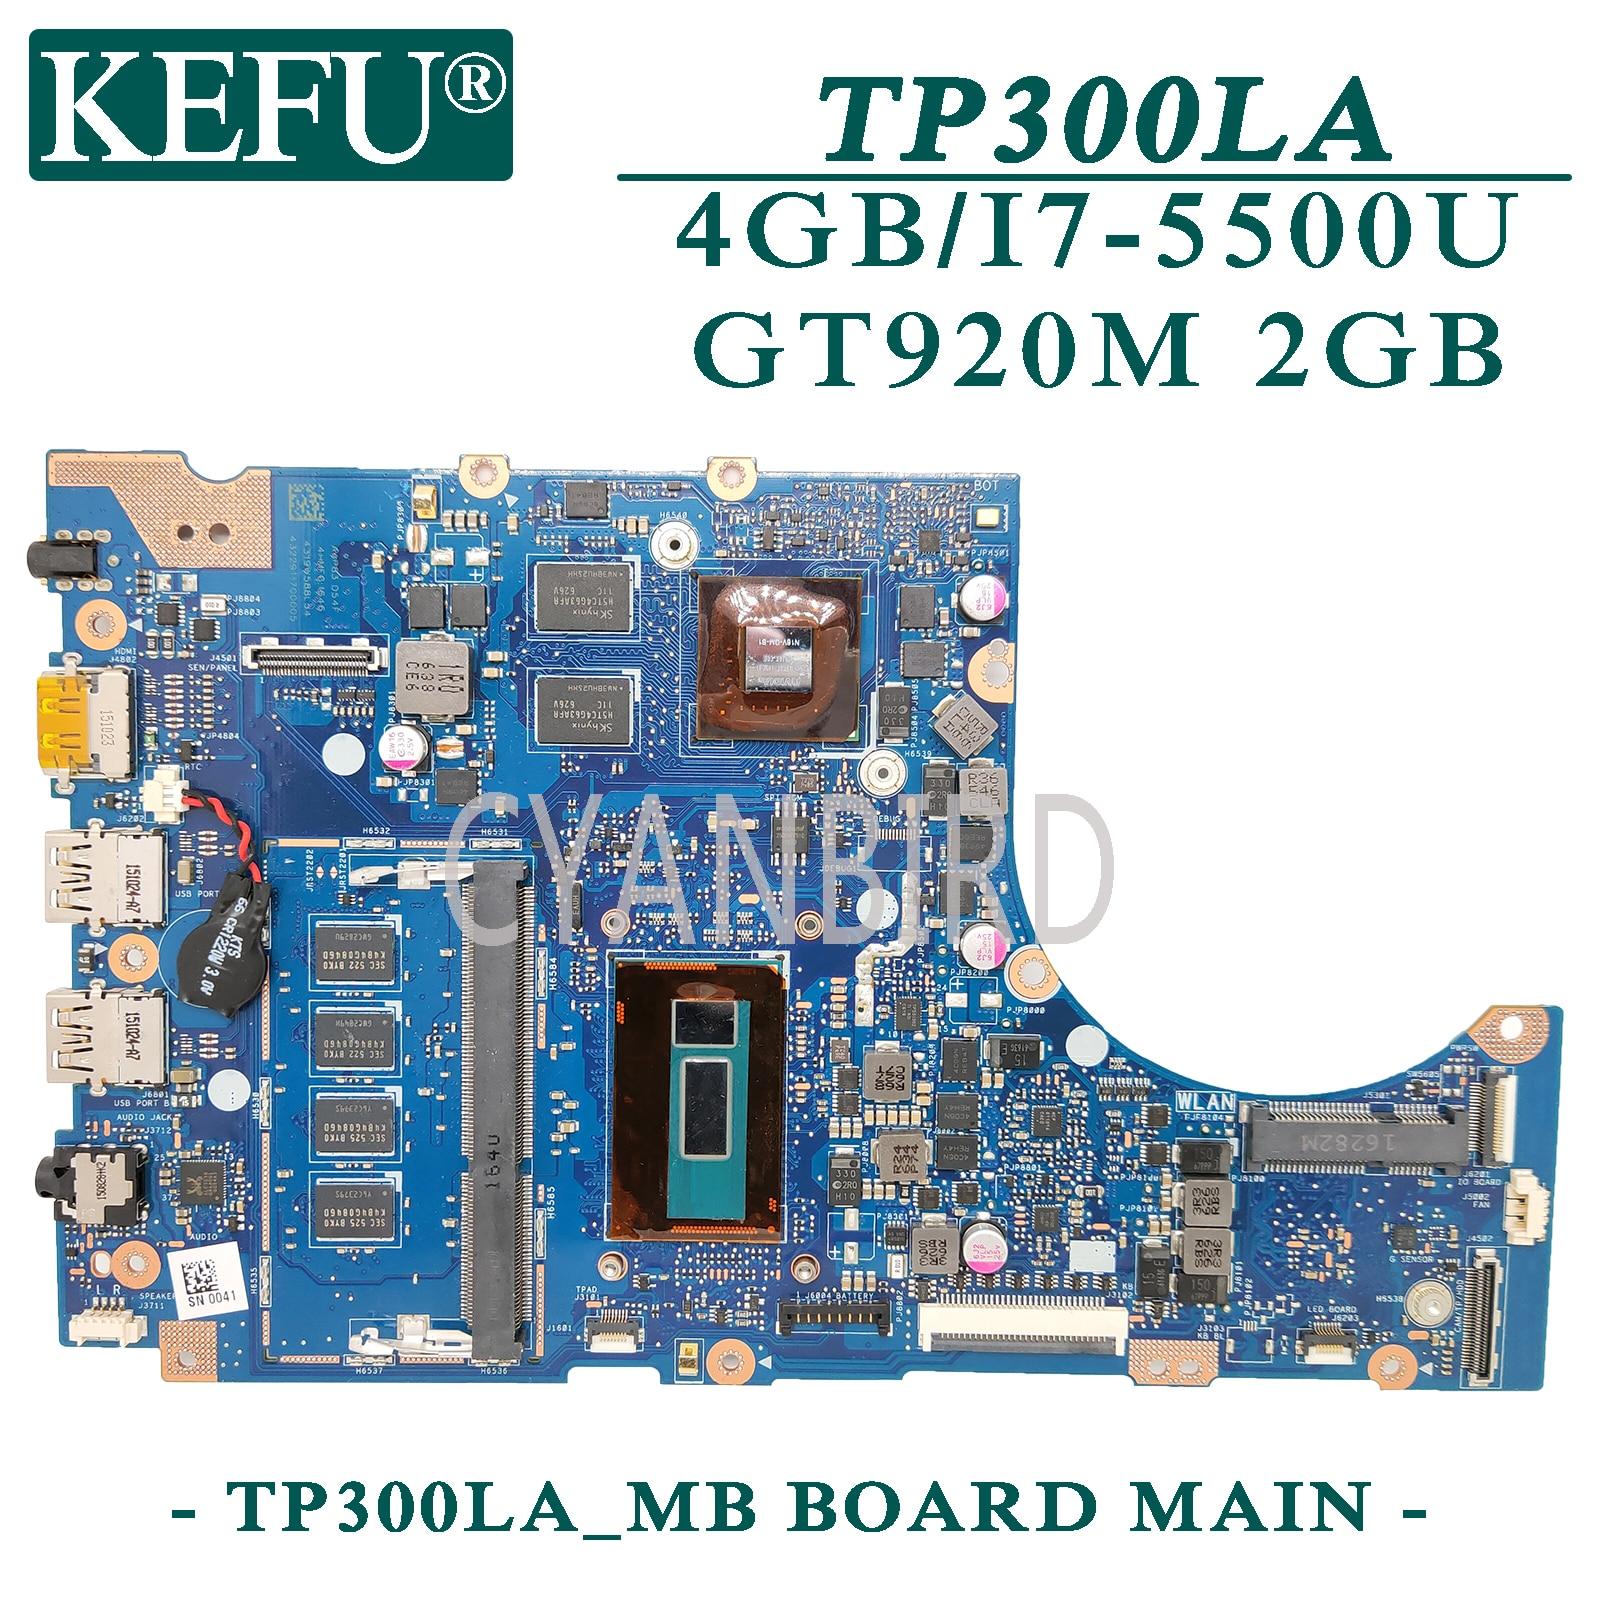 KEFU TP300LA اللوحة الأصلية ل ASUS TP300LA TP300LD مع 4GB-RAM I7-5500U GT920M اللوحة المحمول